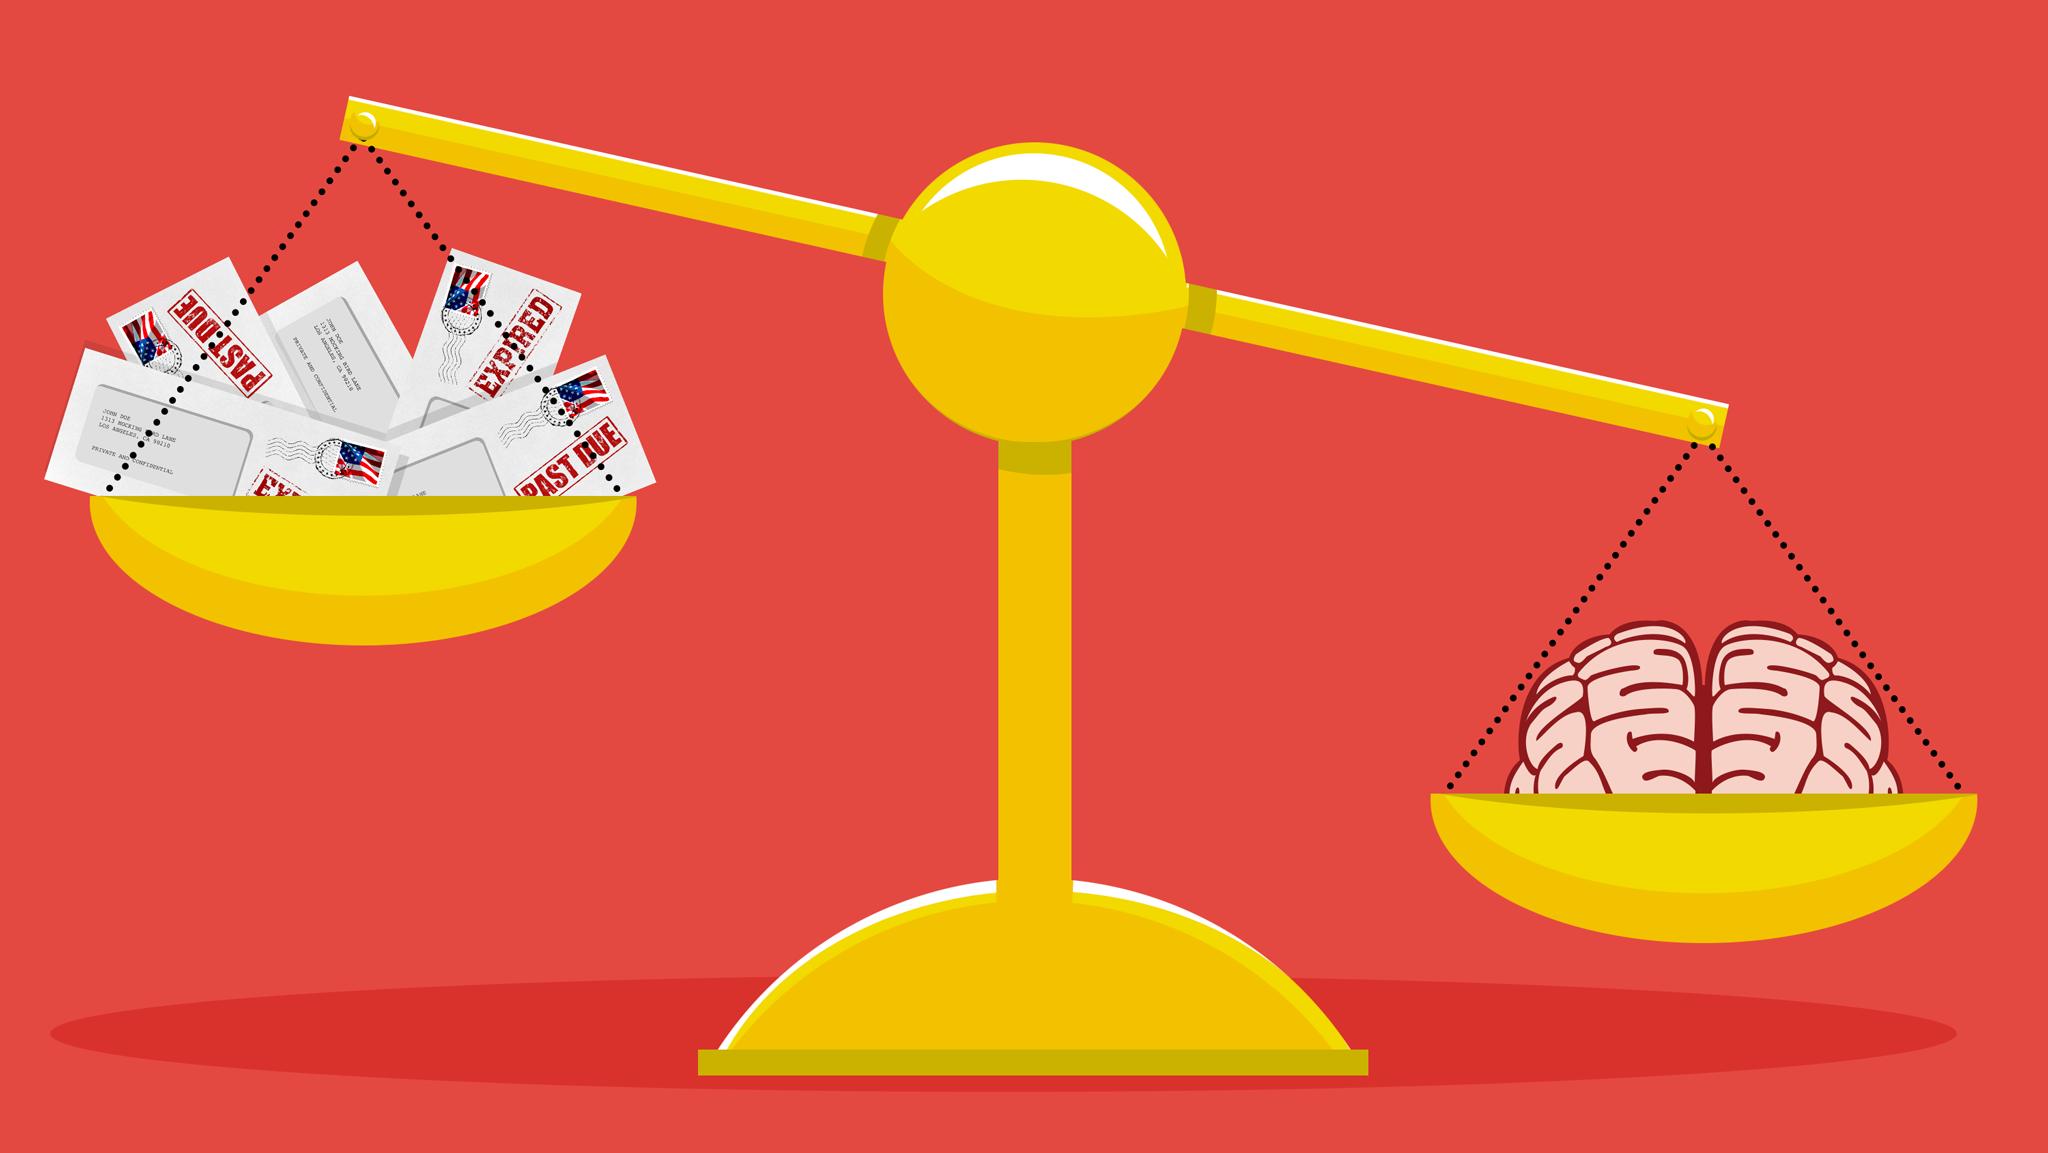 credit-cards debt debt-traps editors-picks personal-finance saving-money student-debt twocents